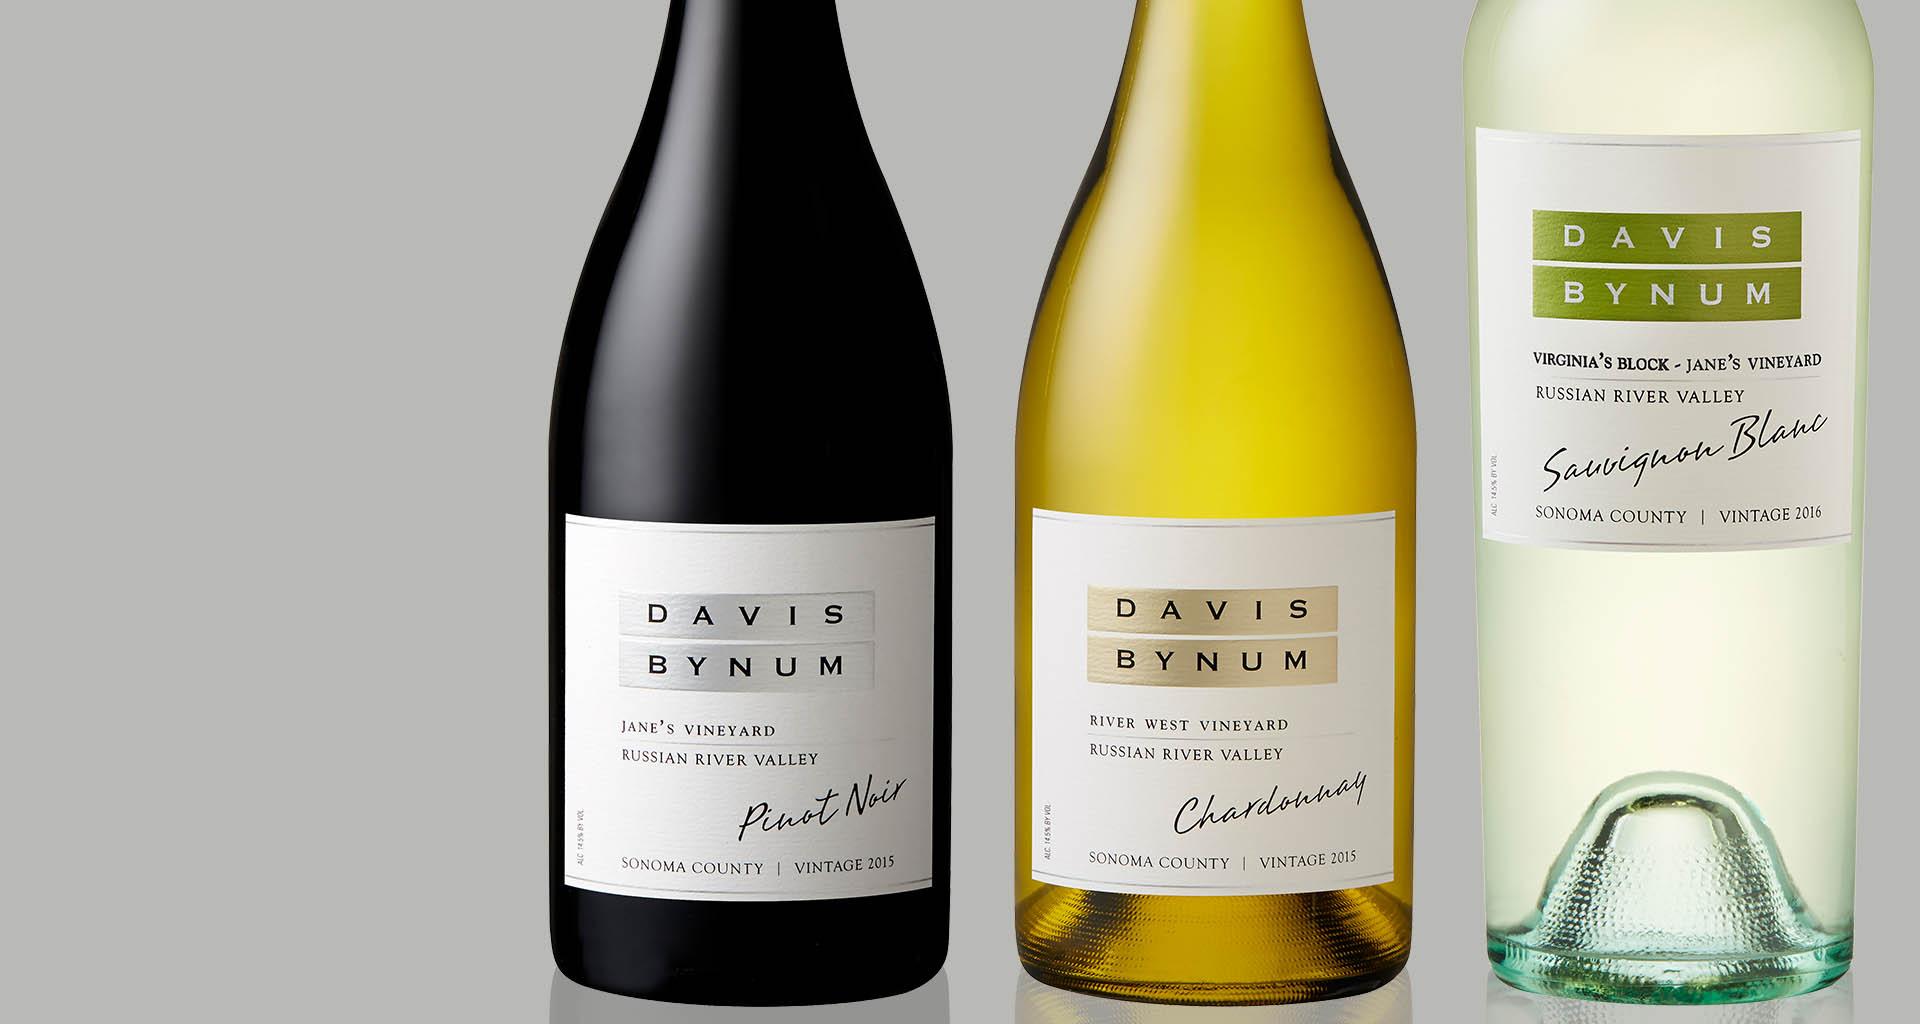 Davis Bynum Pinot Noir and Chardonnay